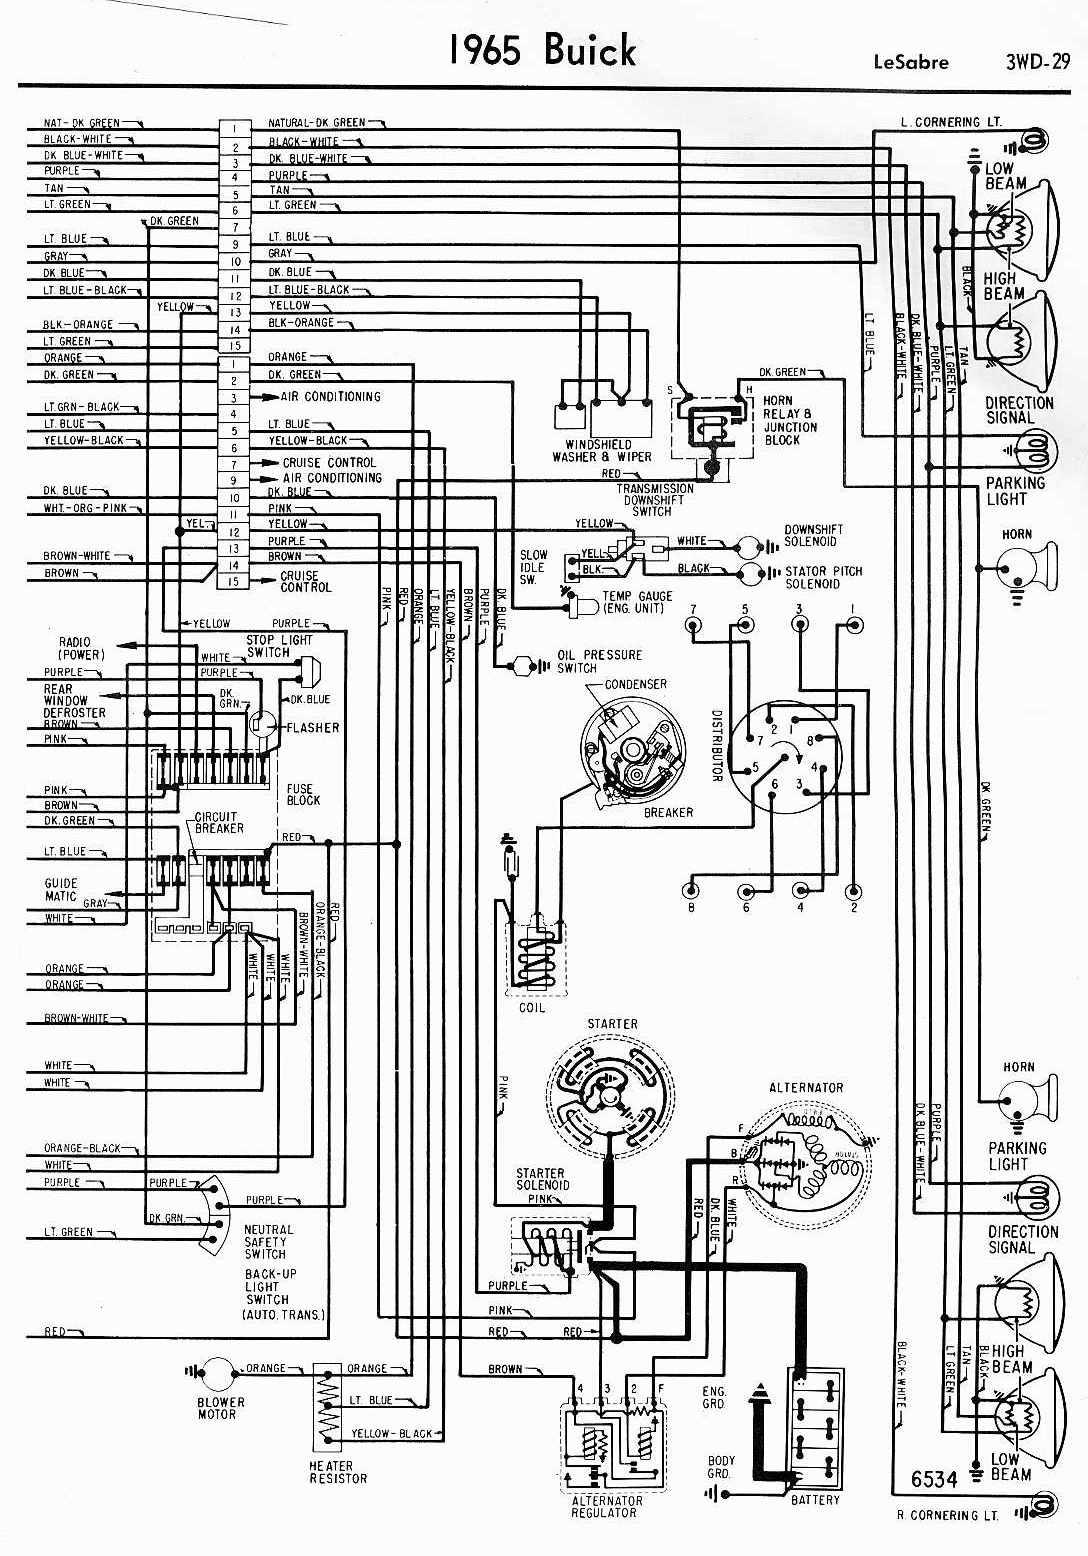 Funky Brandmotion Backup Camera Wiring Diagram Frieze - Electrical ...